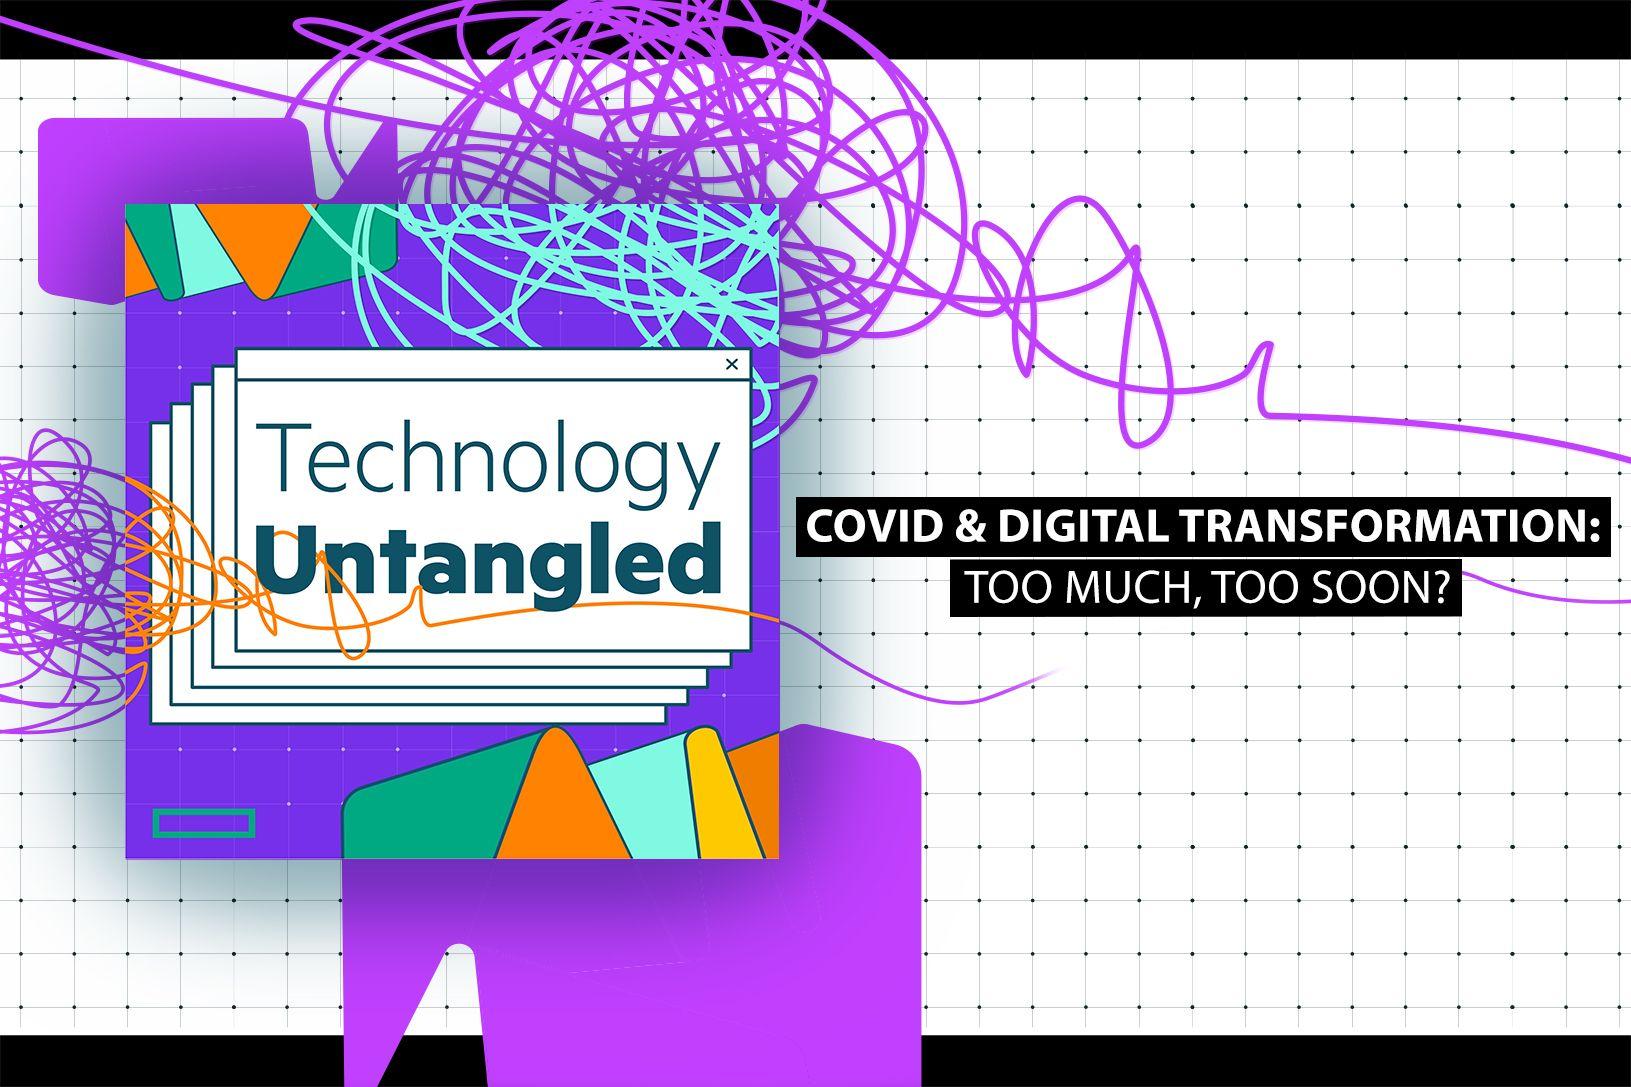 Blog Post 800x533 copy Covid and transformation.jpg